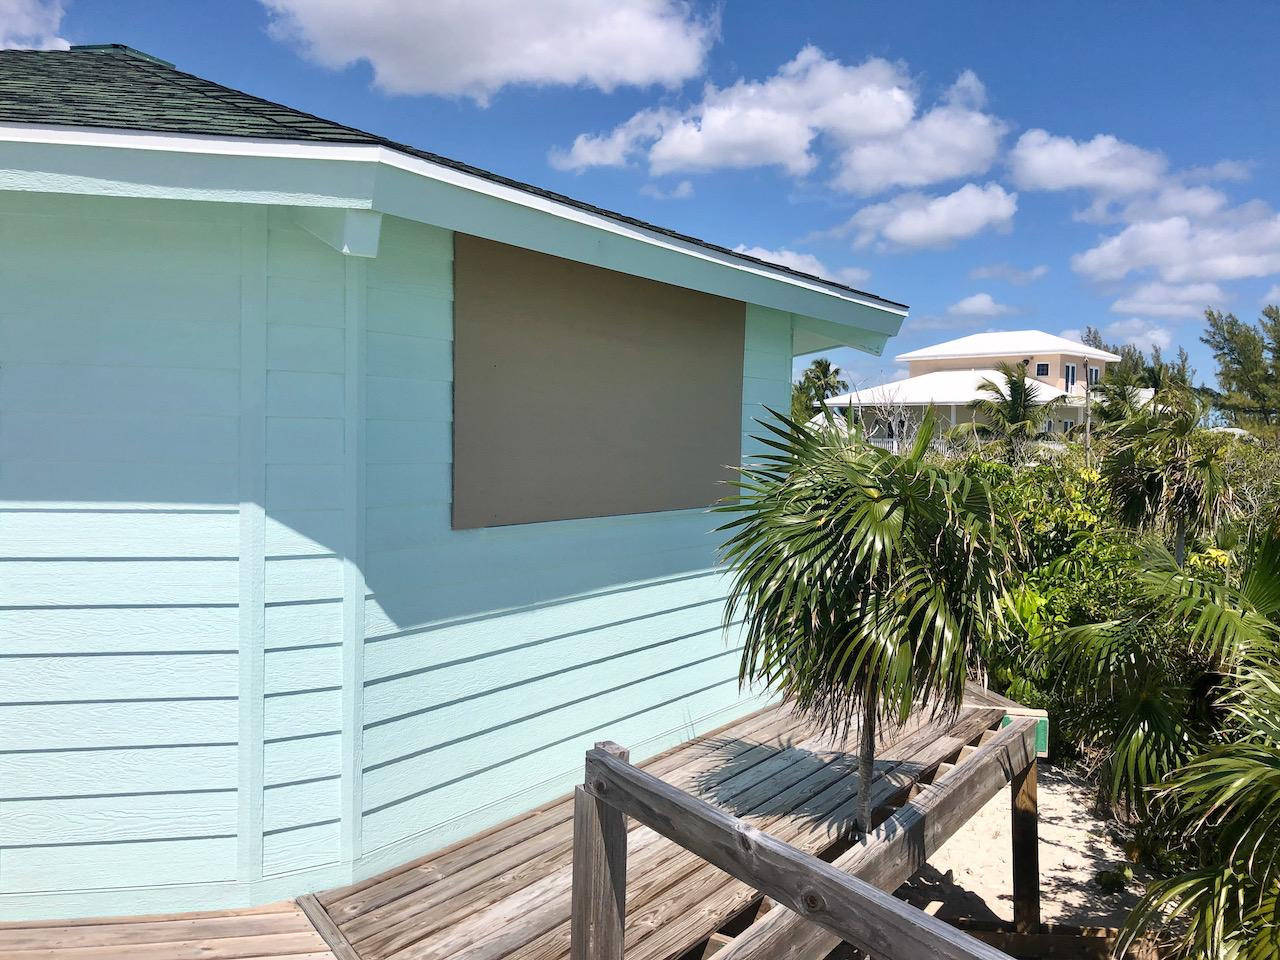 bahama-palm-shores-beachfront-home-for-sale-3